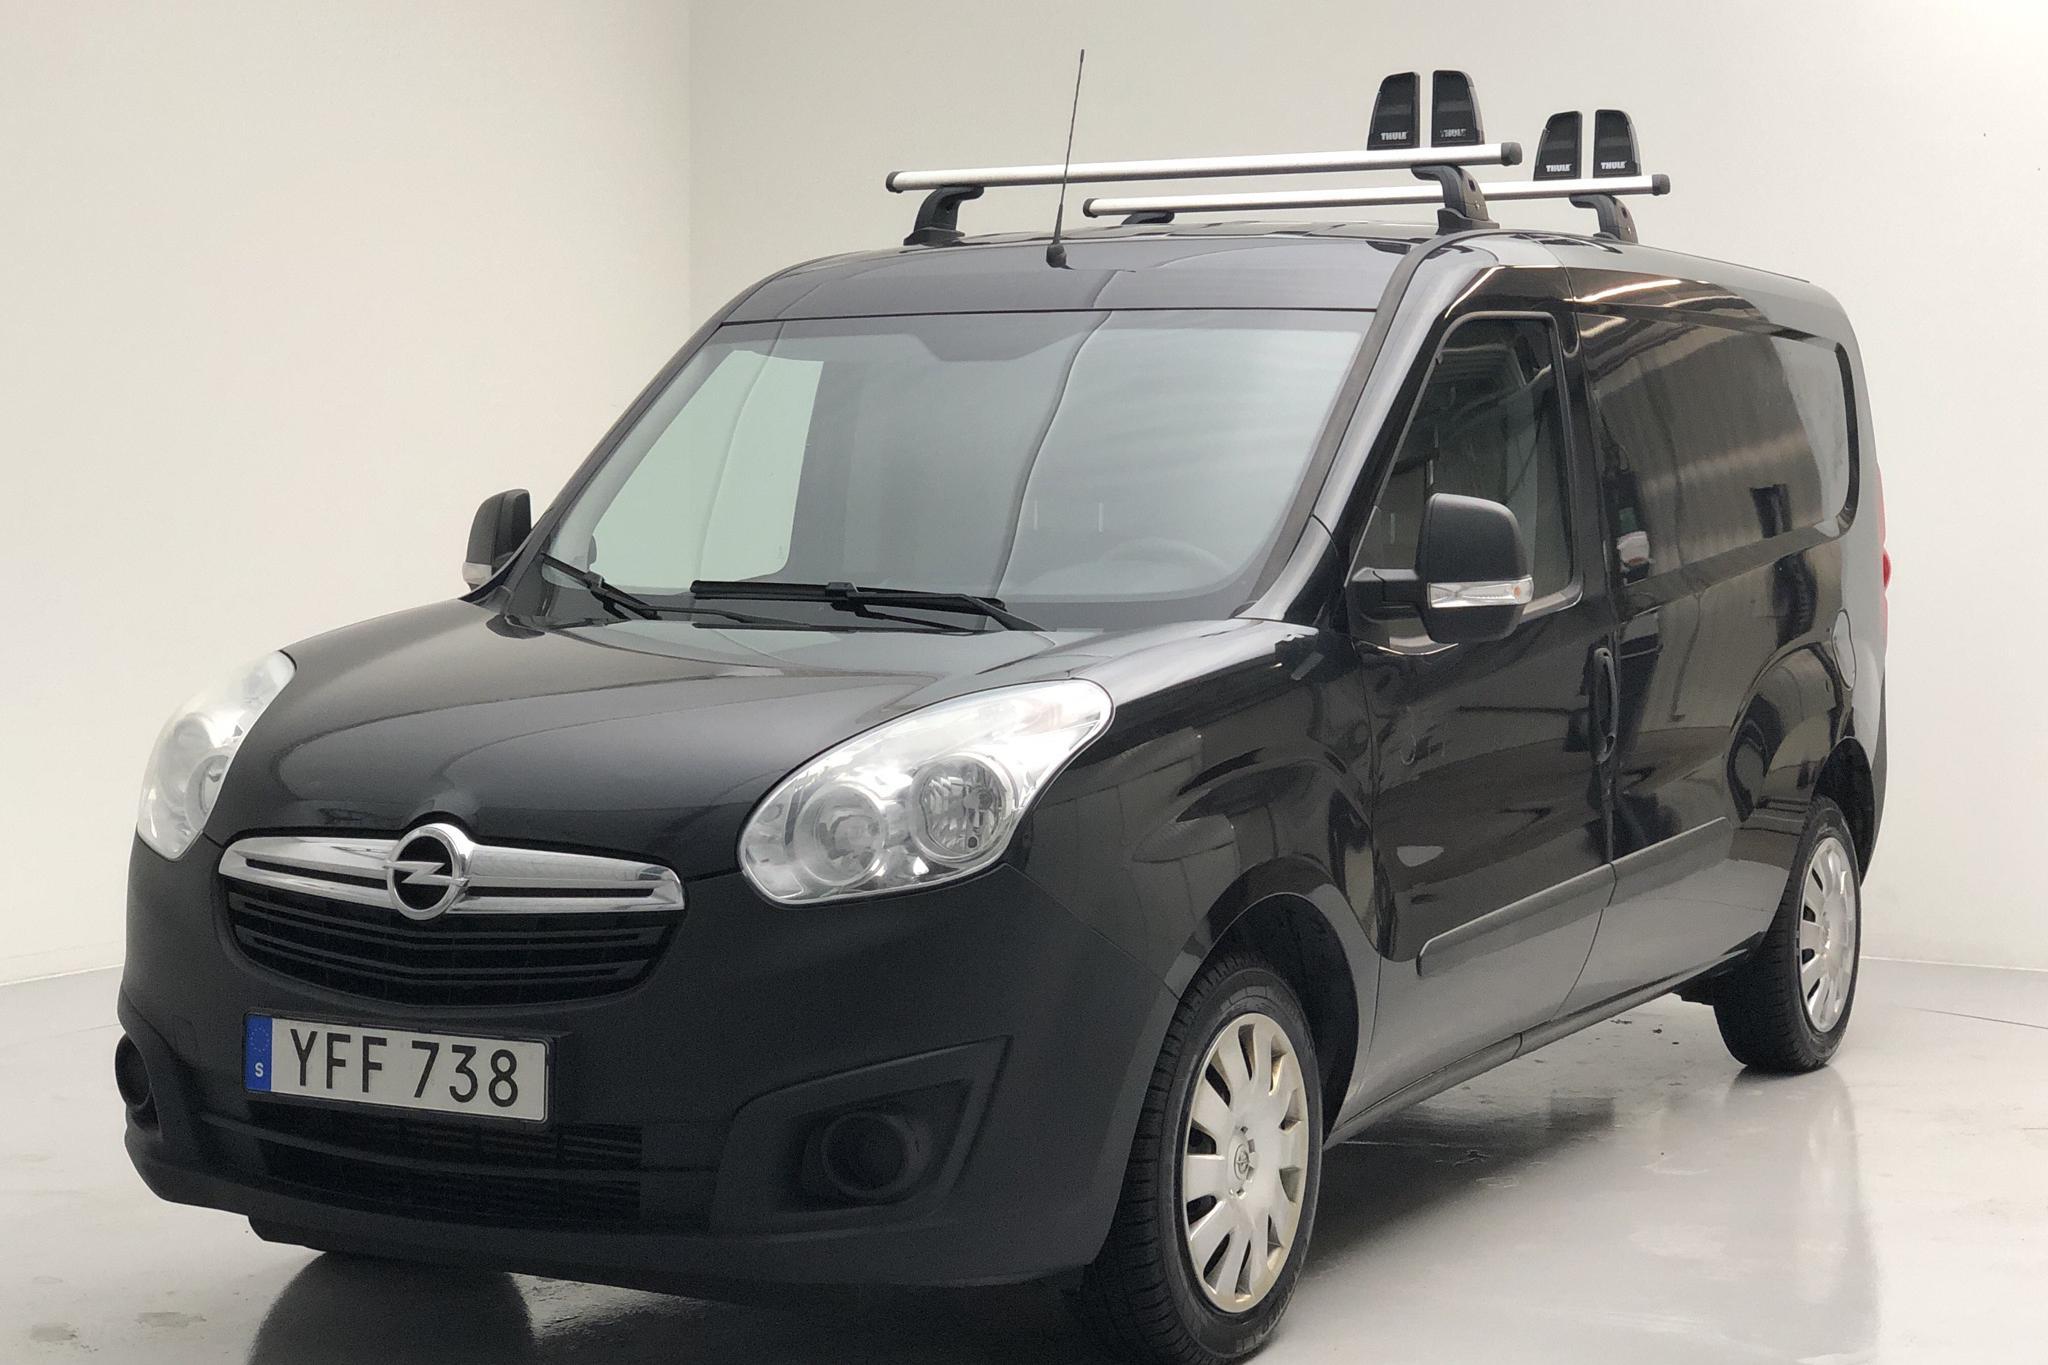 Opel Combo 1.3 CDTI Skåp (95hk) - 11 981 mil - Manuell - svart - 2017